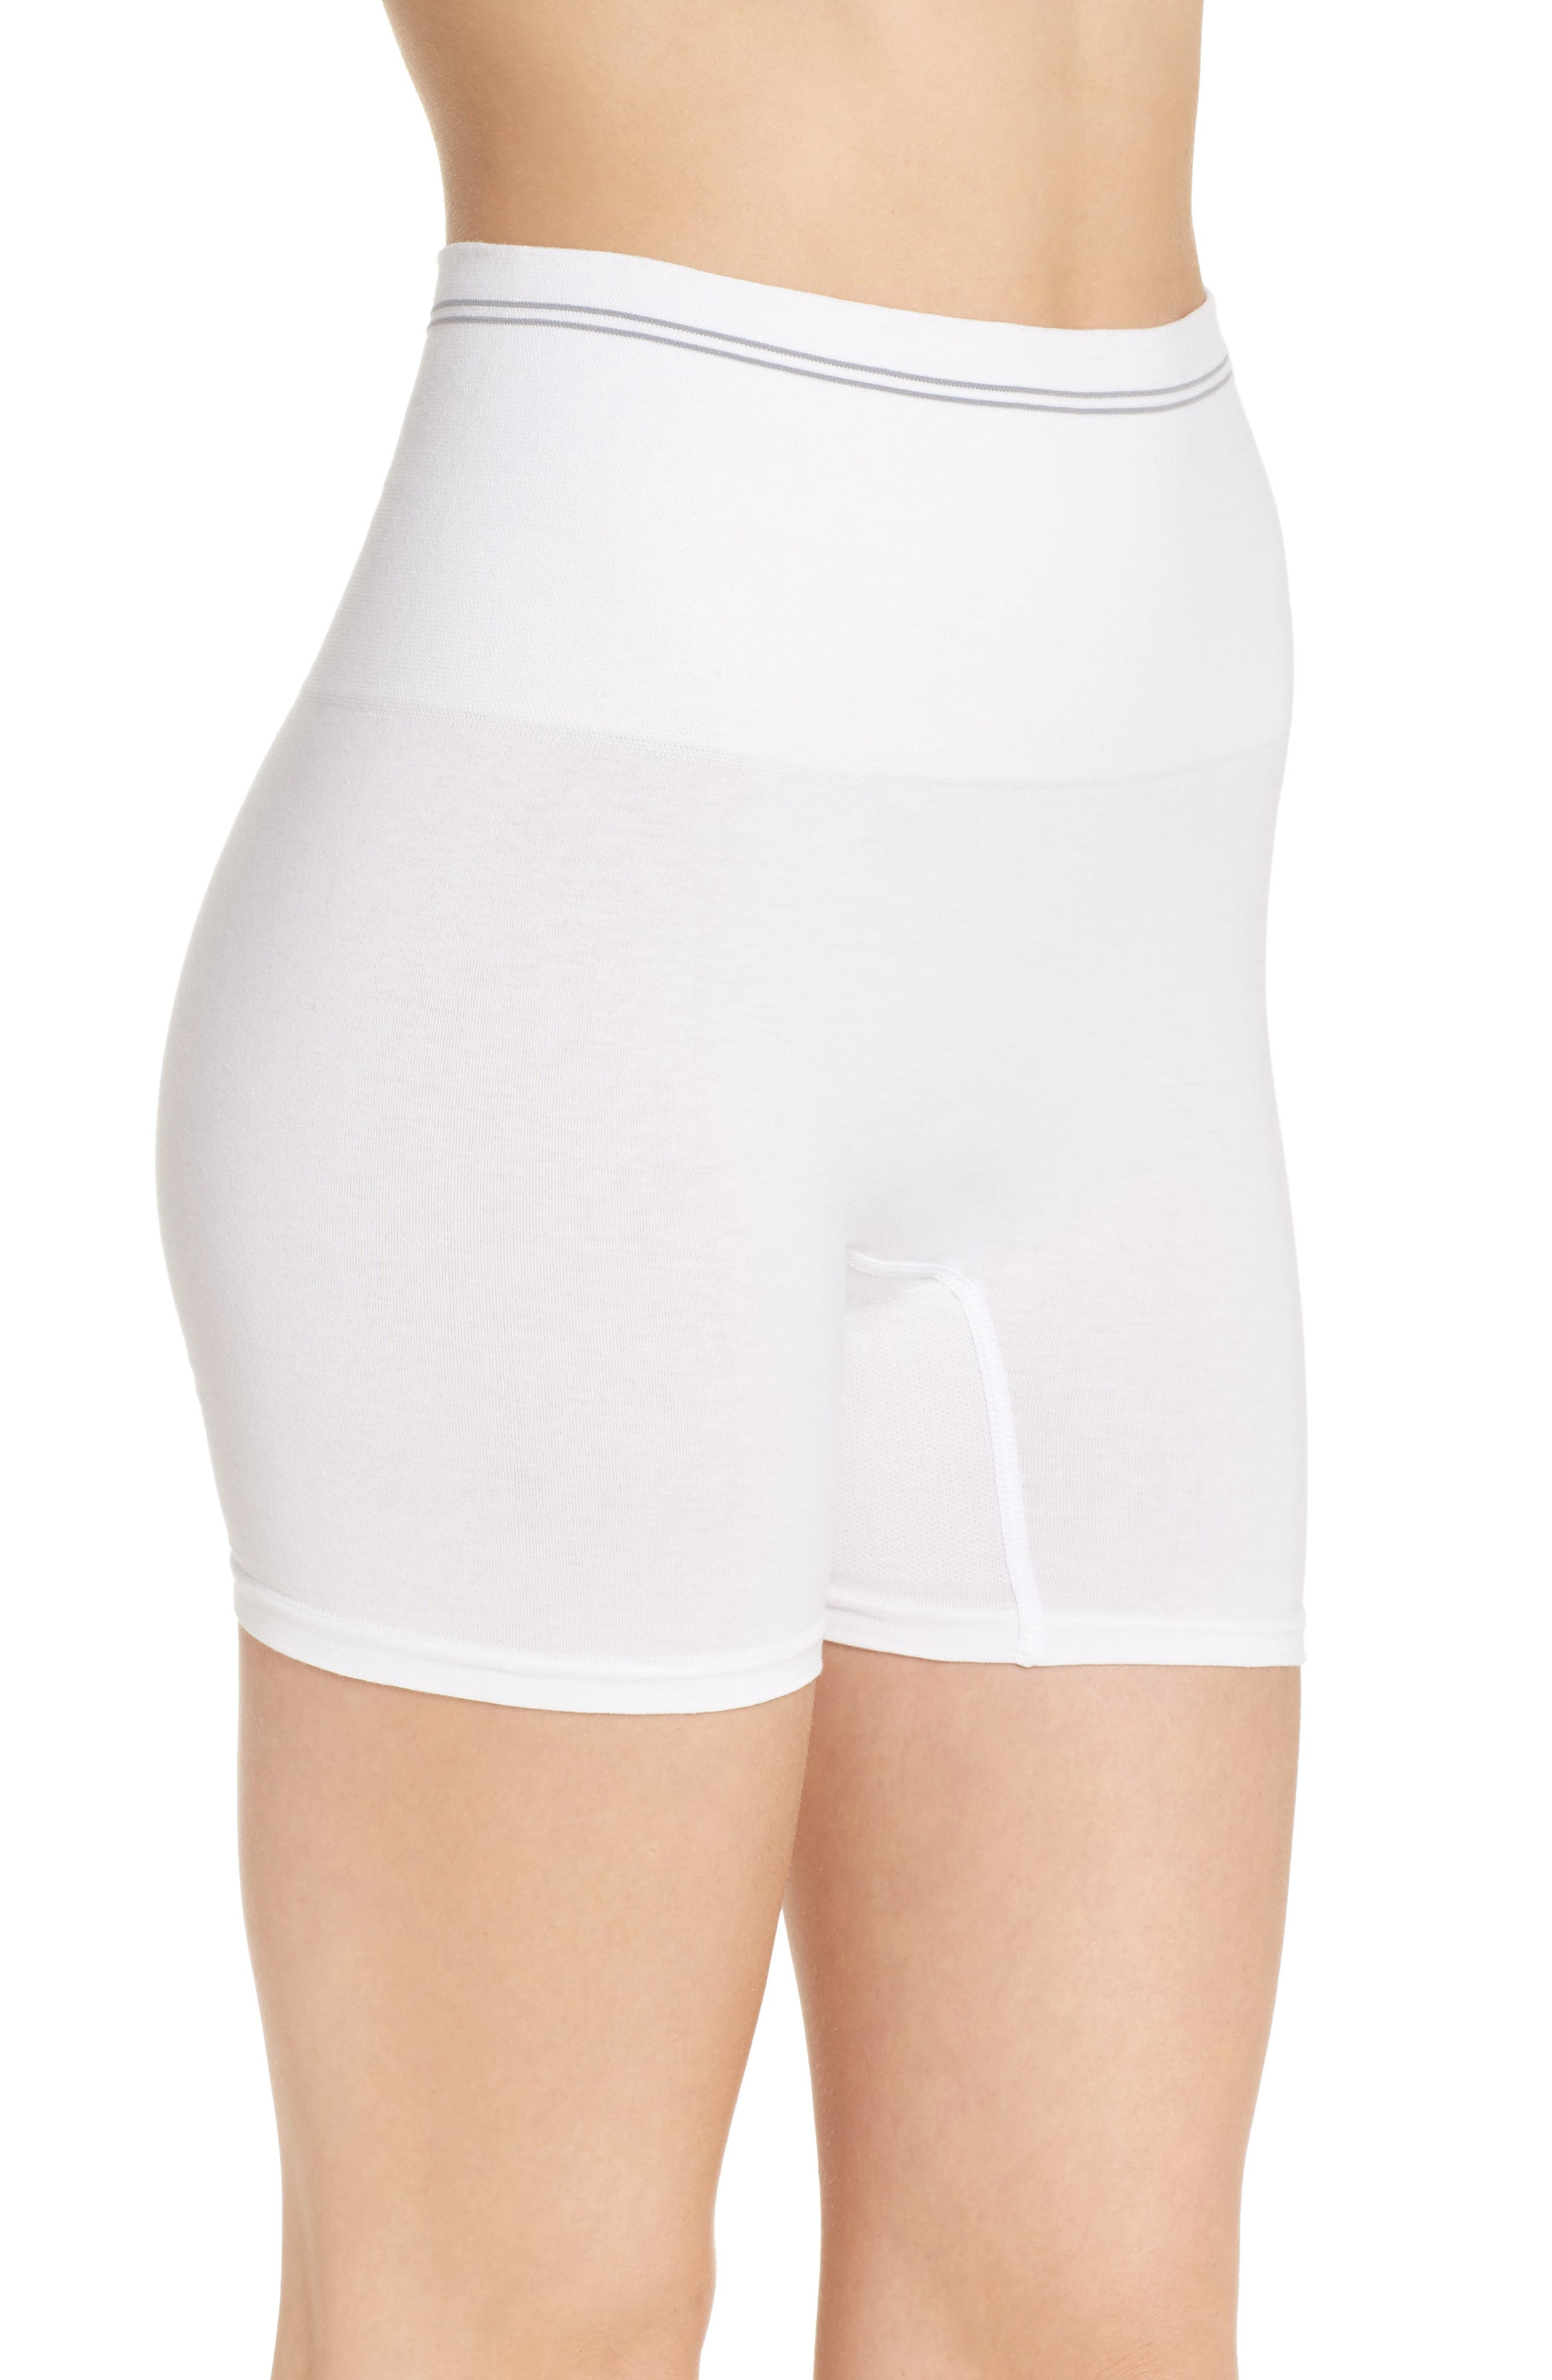 Seamless Shaping Shorts,                             Alternate thumbnail 3, color,                             White